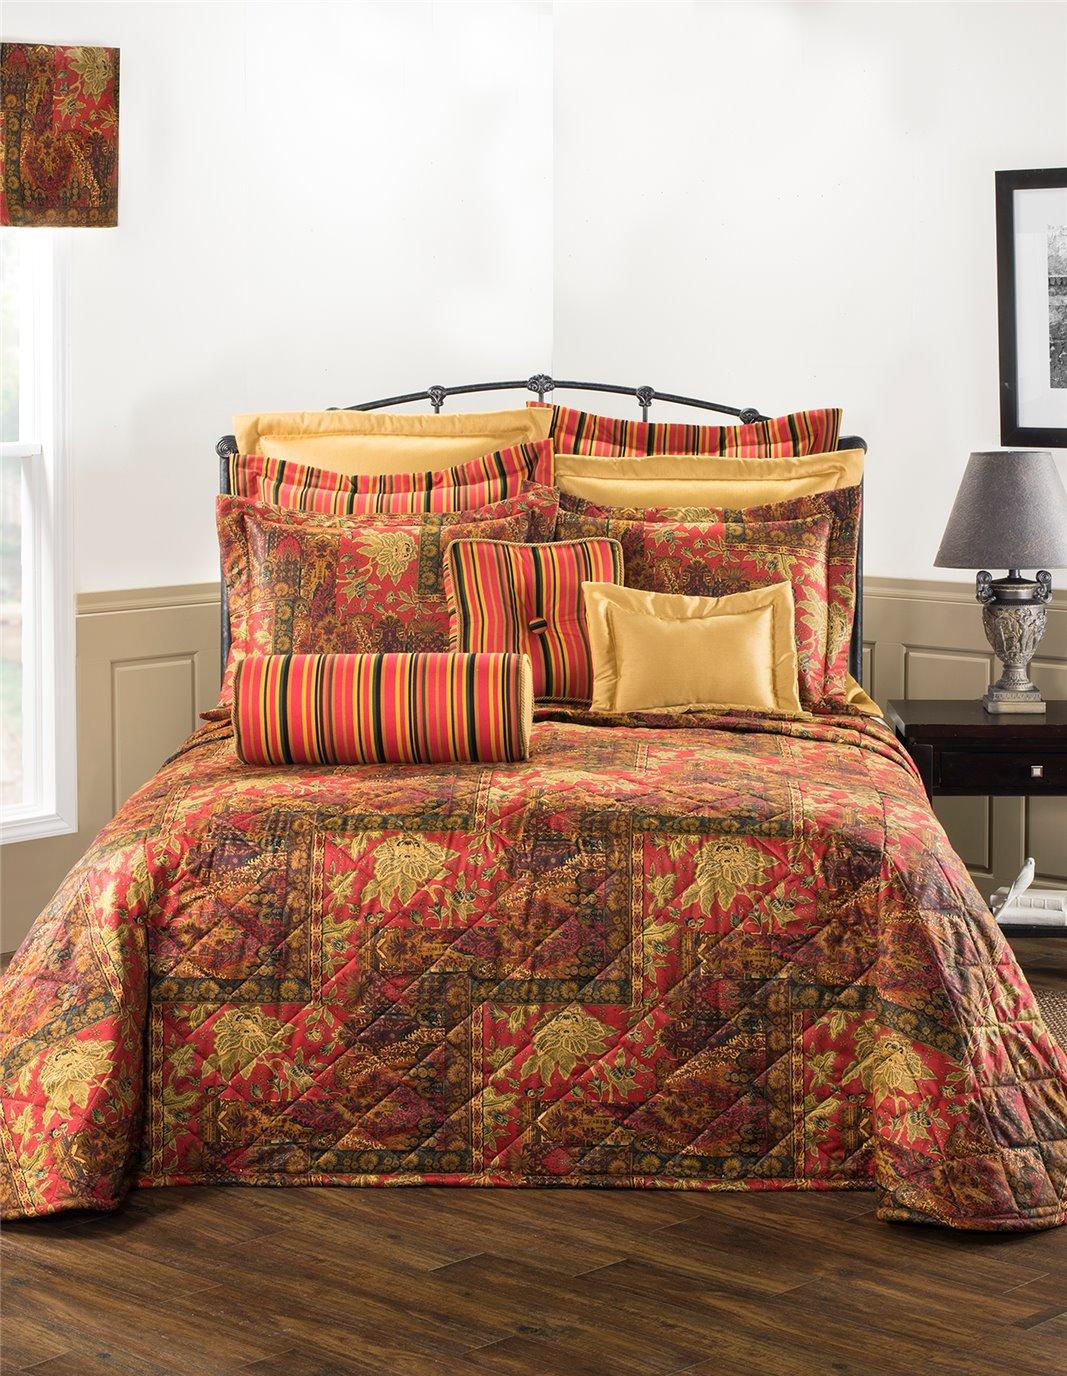 Kalinjar Twin Bedspread